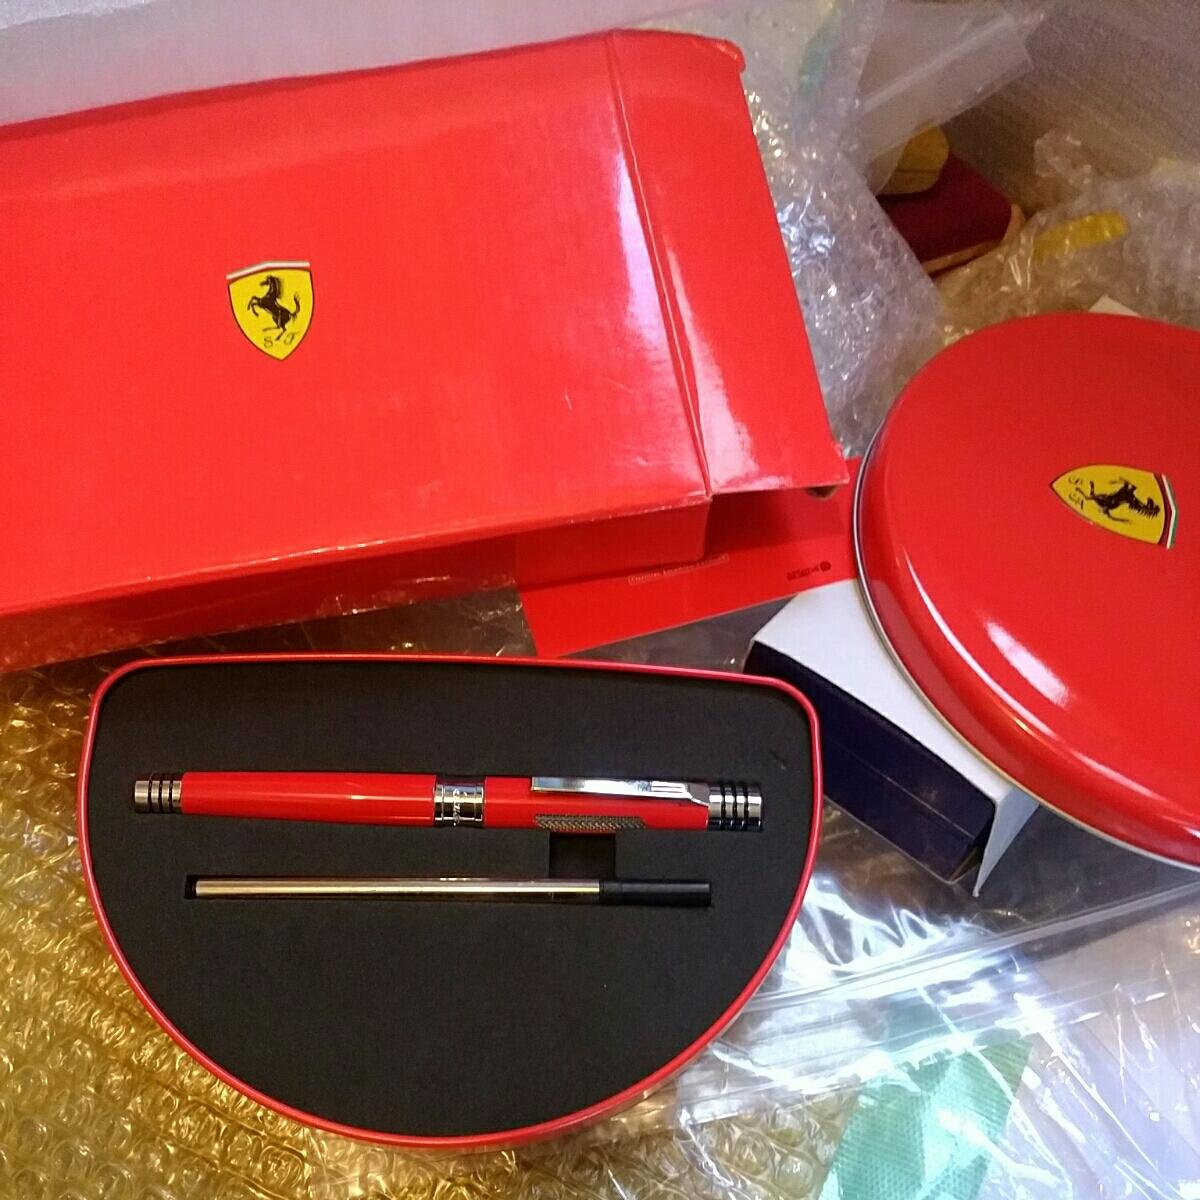 Ferrari ballpoint pen